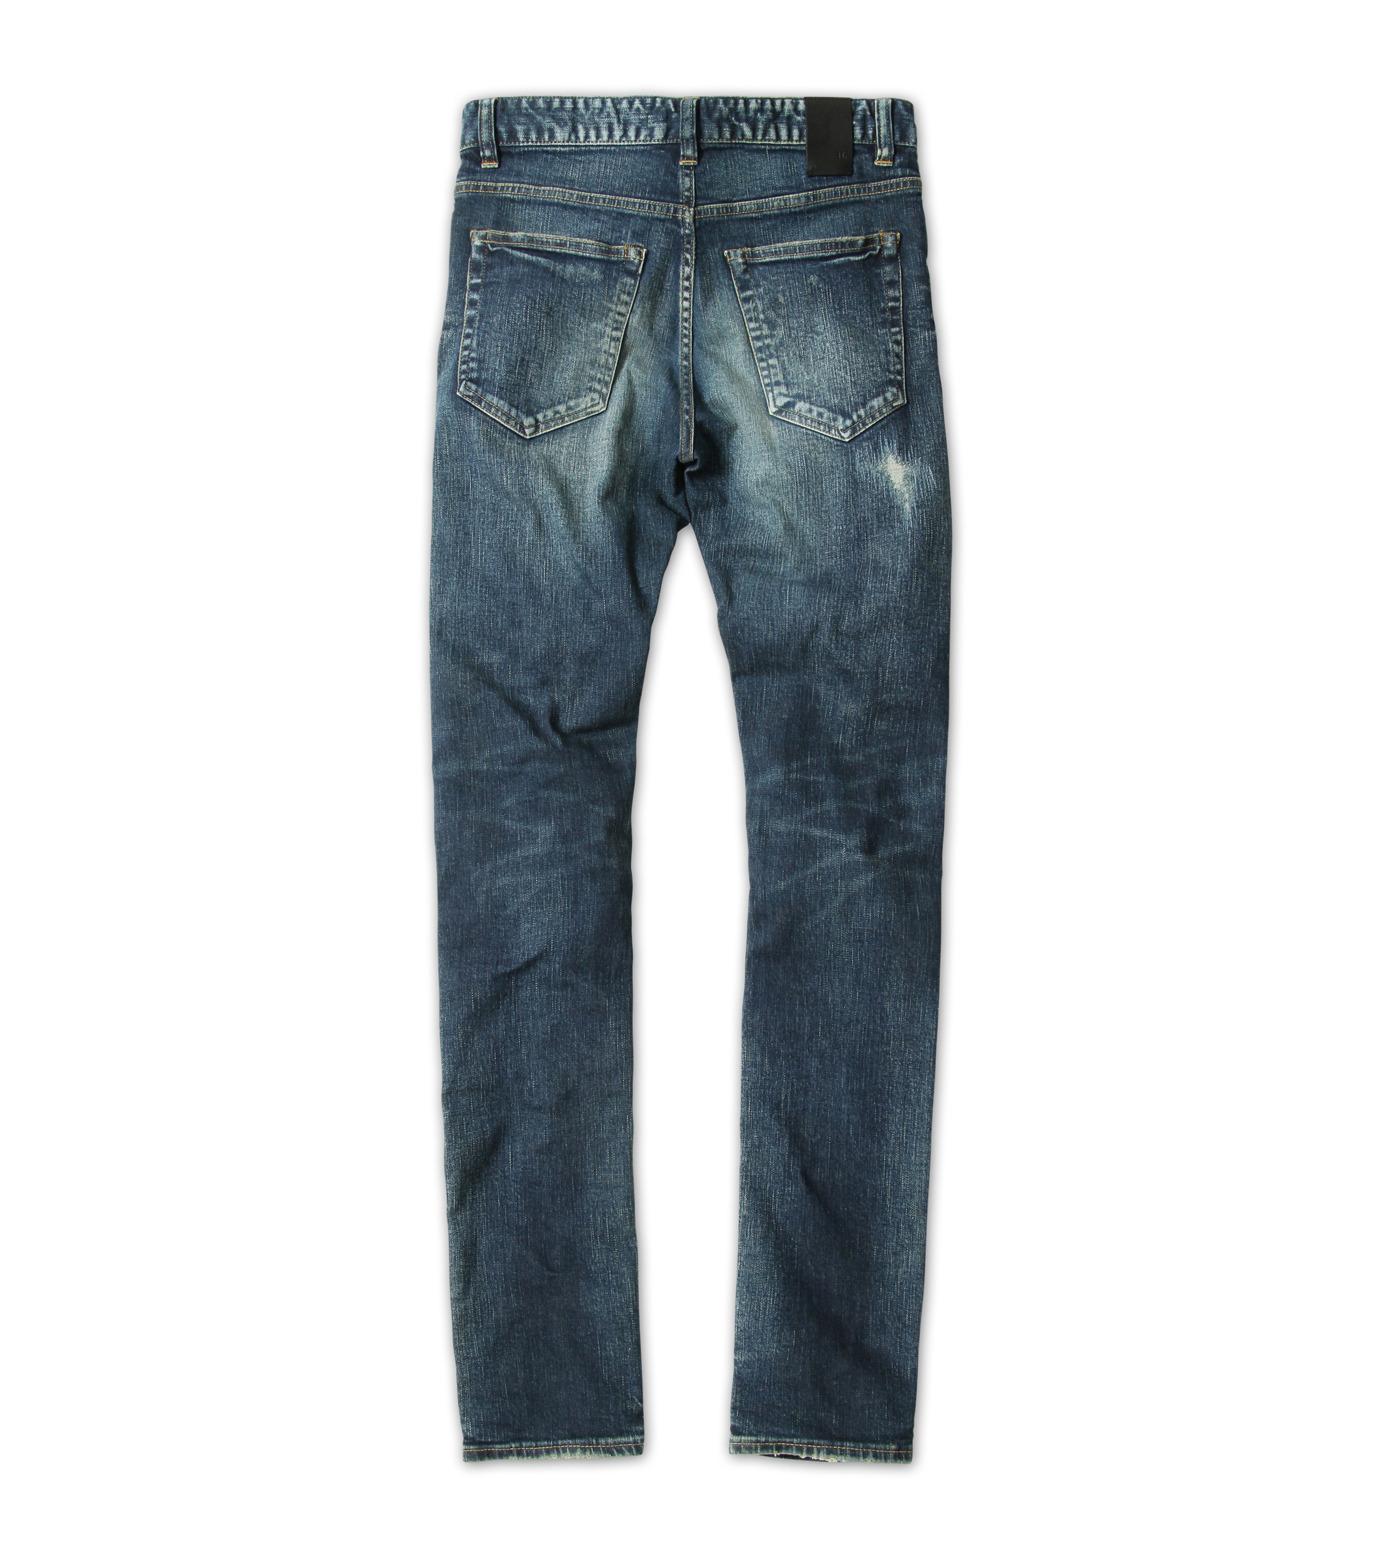 HL HEDDIE LOVU(エイチエル・エディールーヴ)のHL skinDamage-INDIGO(パンツ/pants)-HL-skinDamag-94 拡大詳細画像7